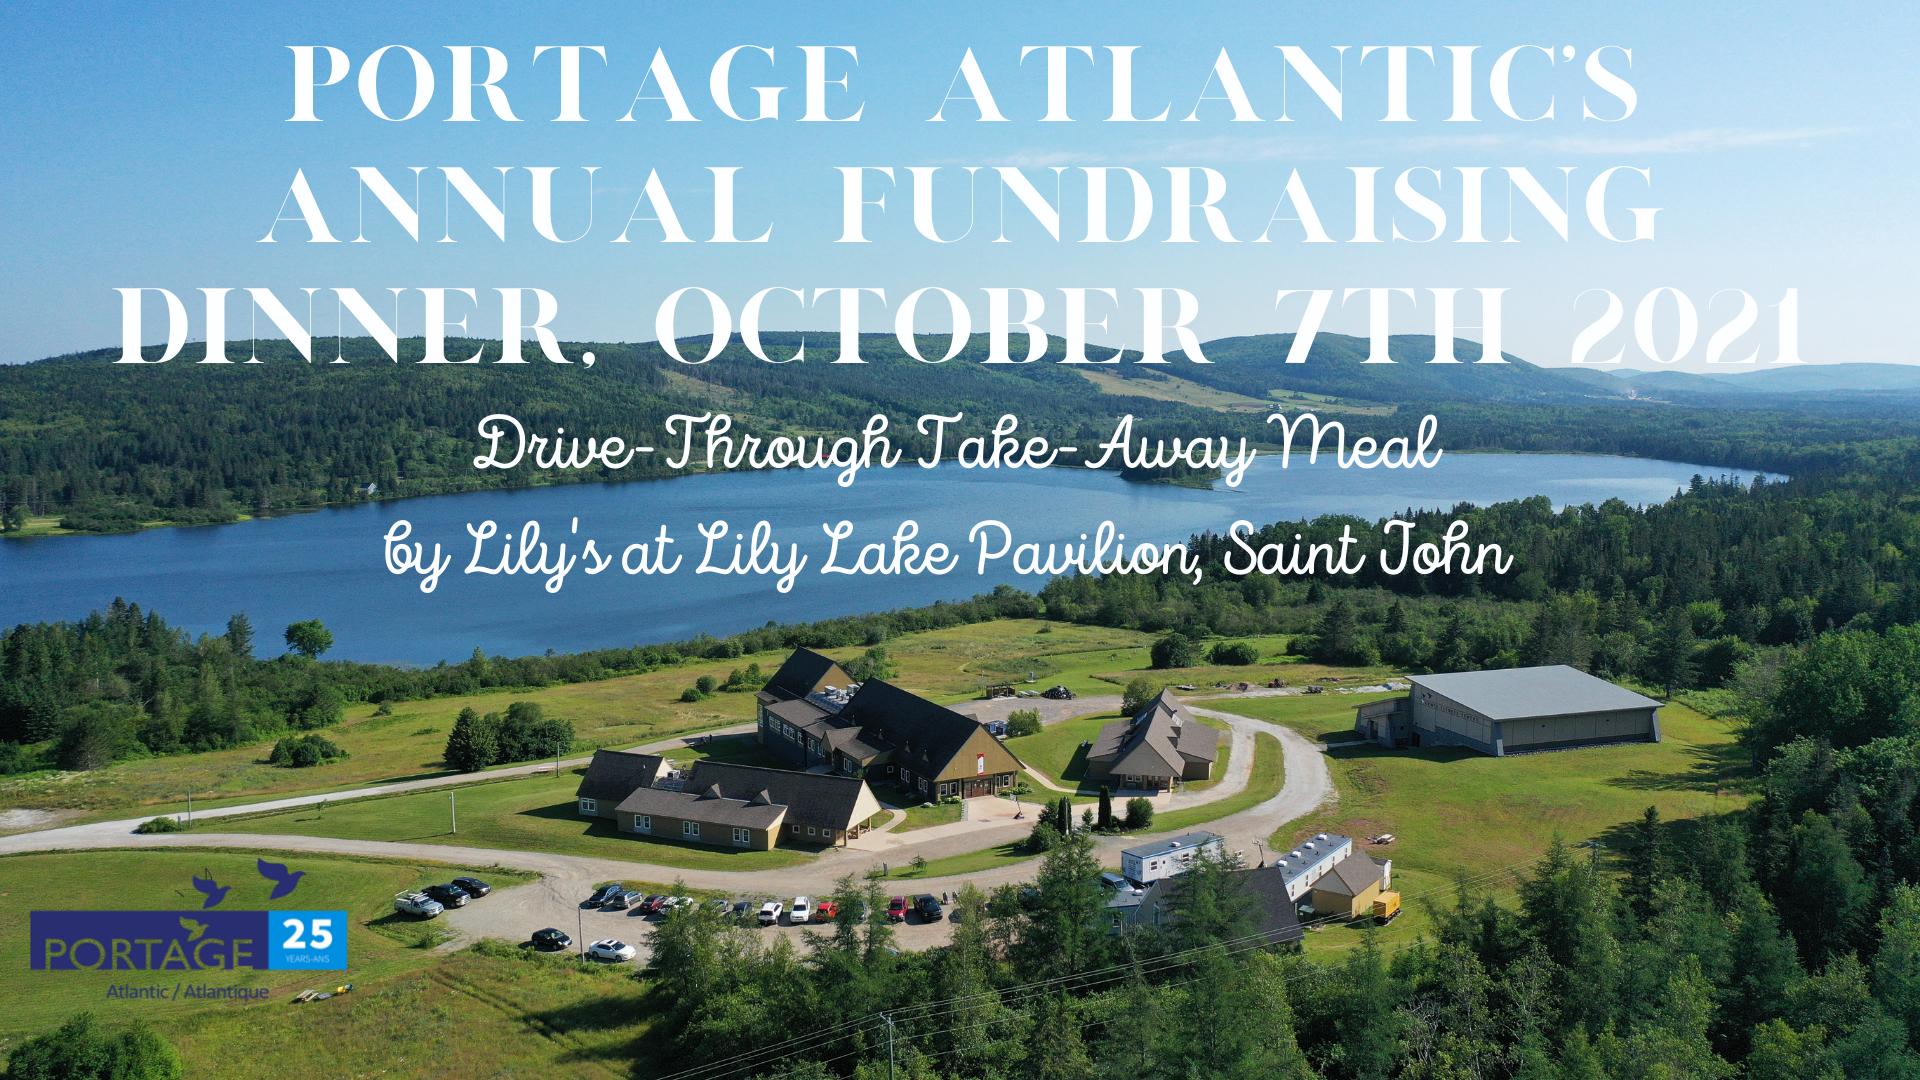 Saint John Event Landing Page Photo